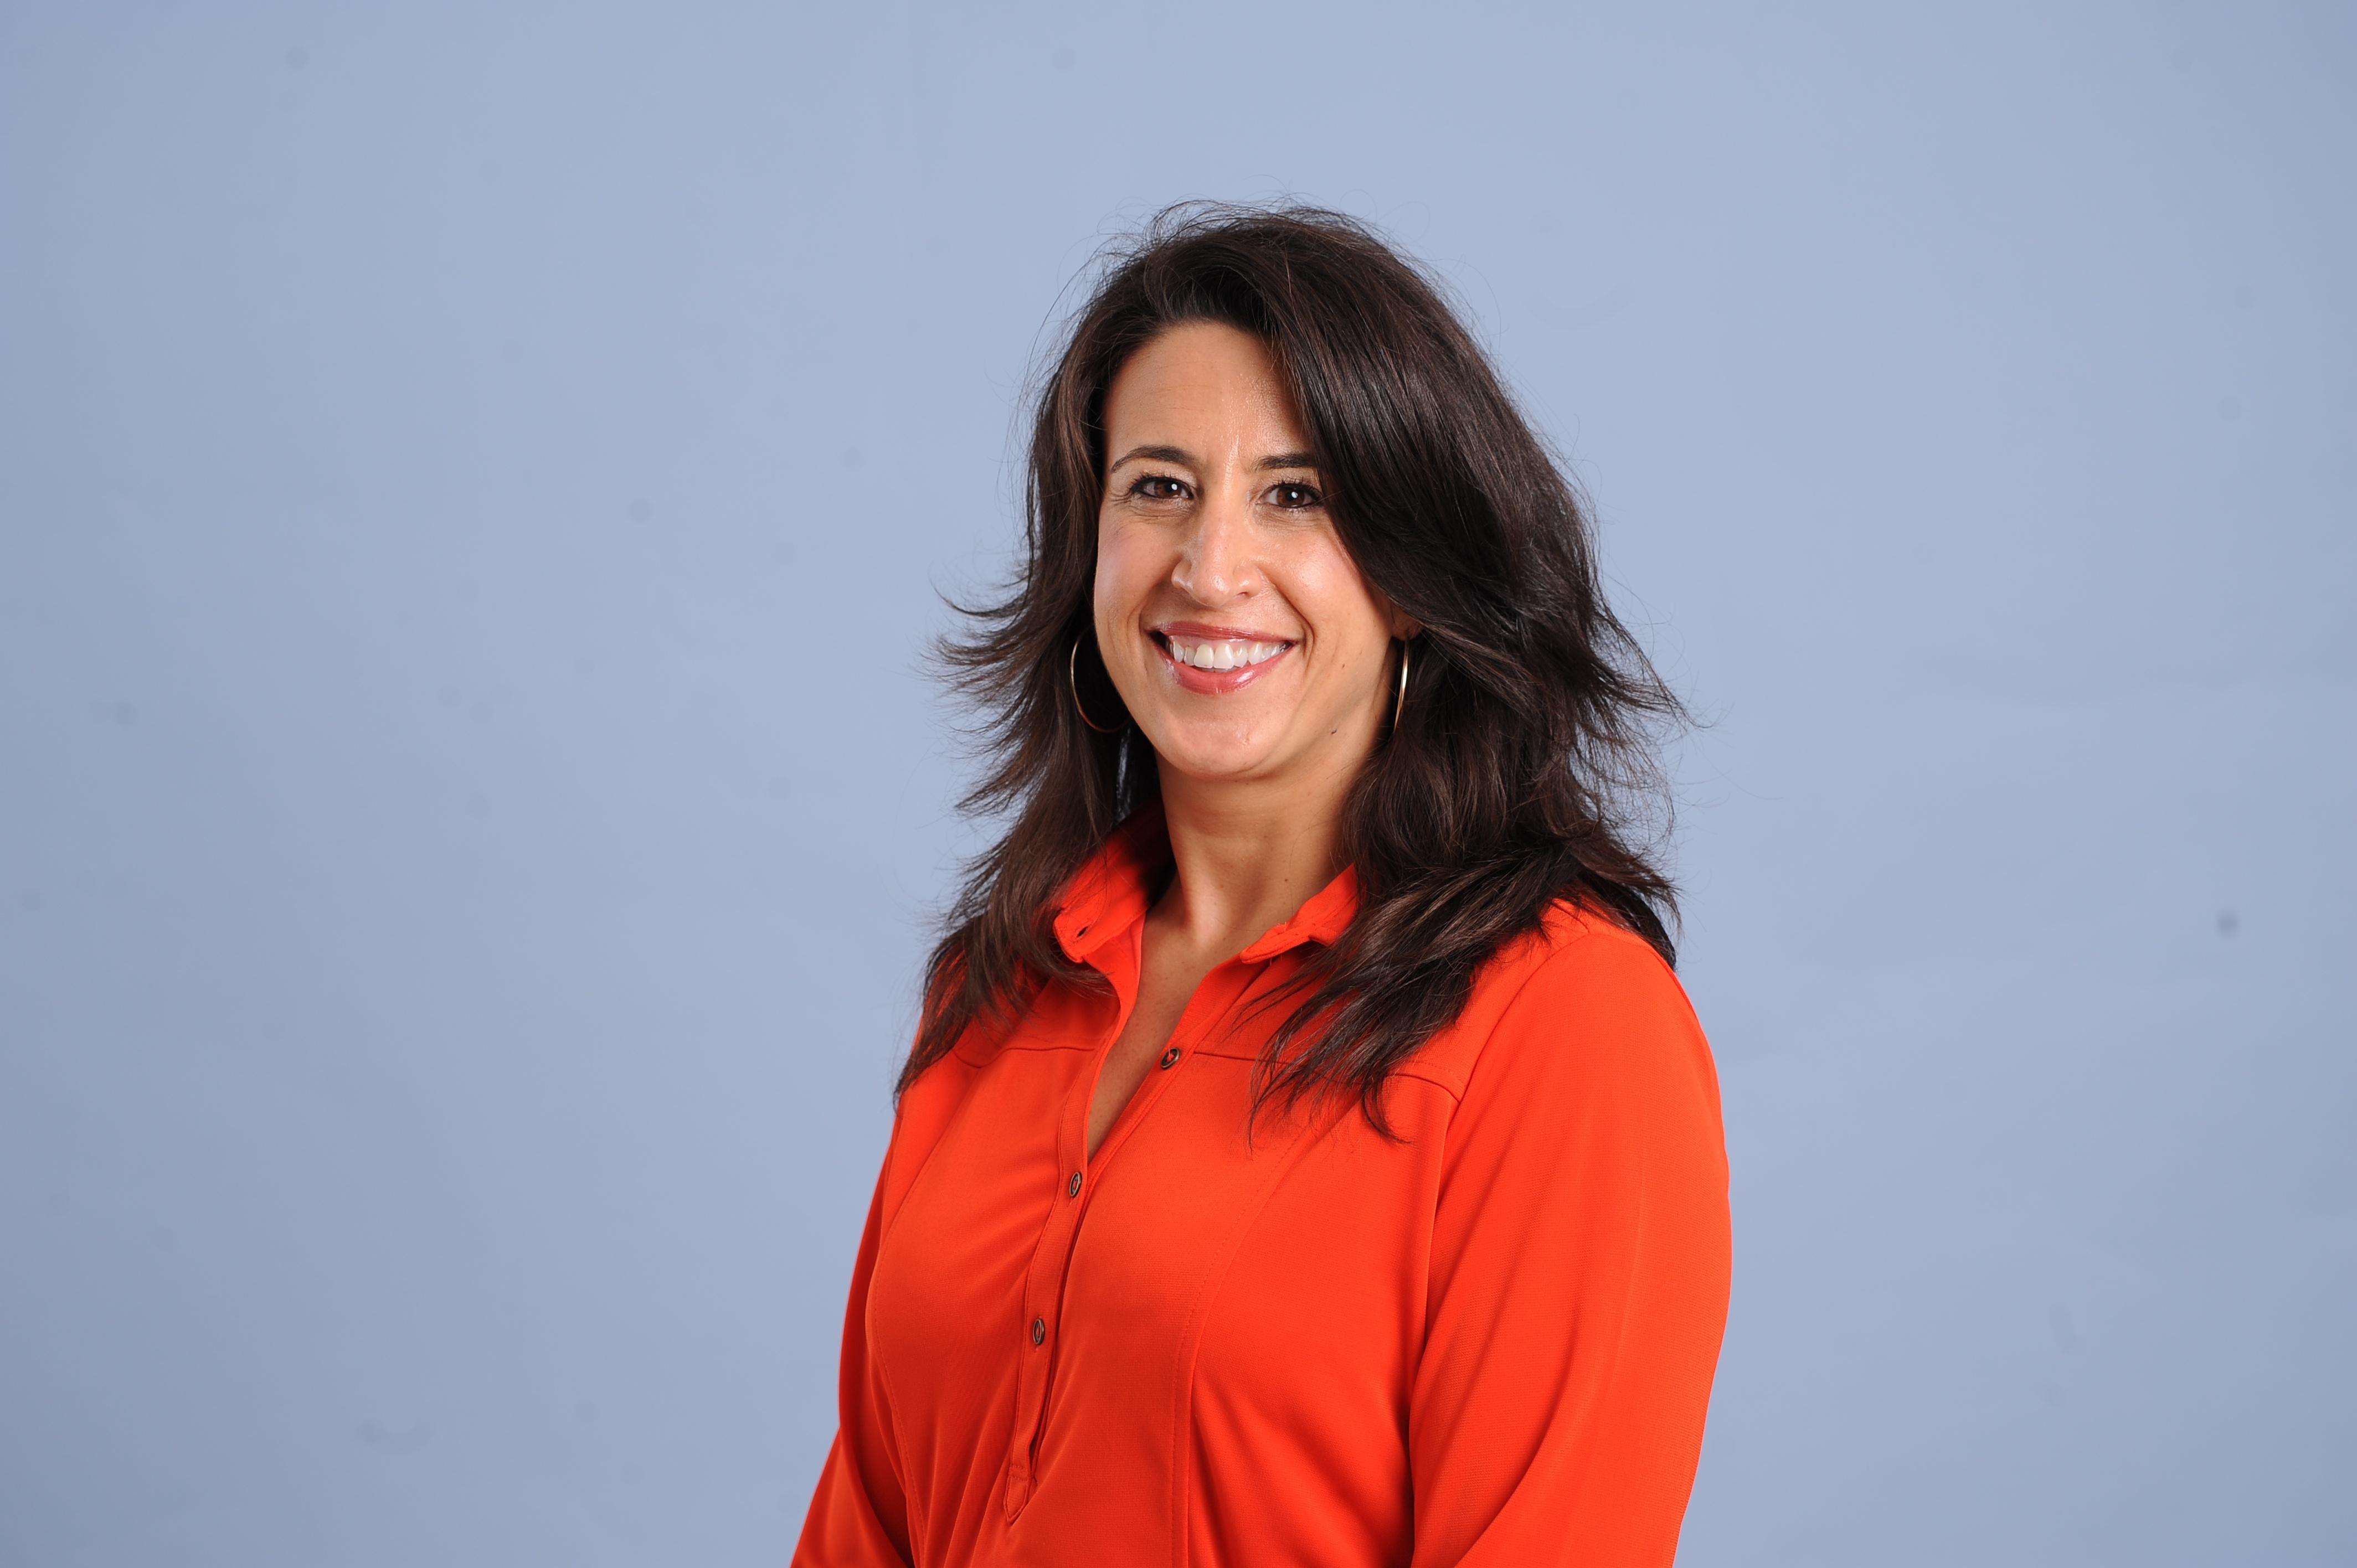 Dr. Valerie Kattouf